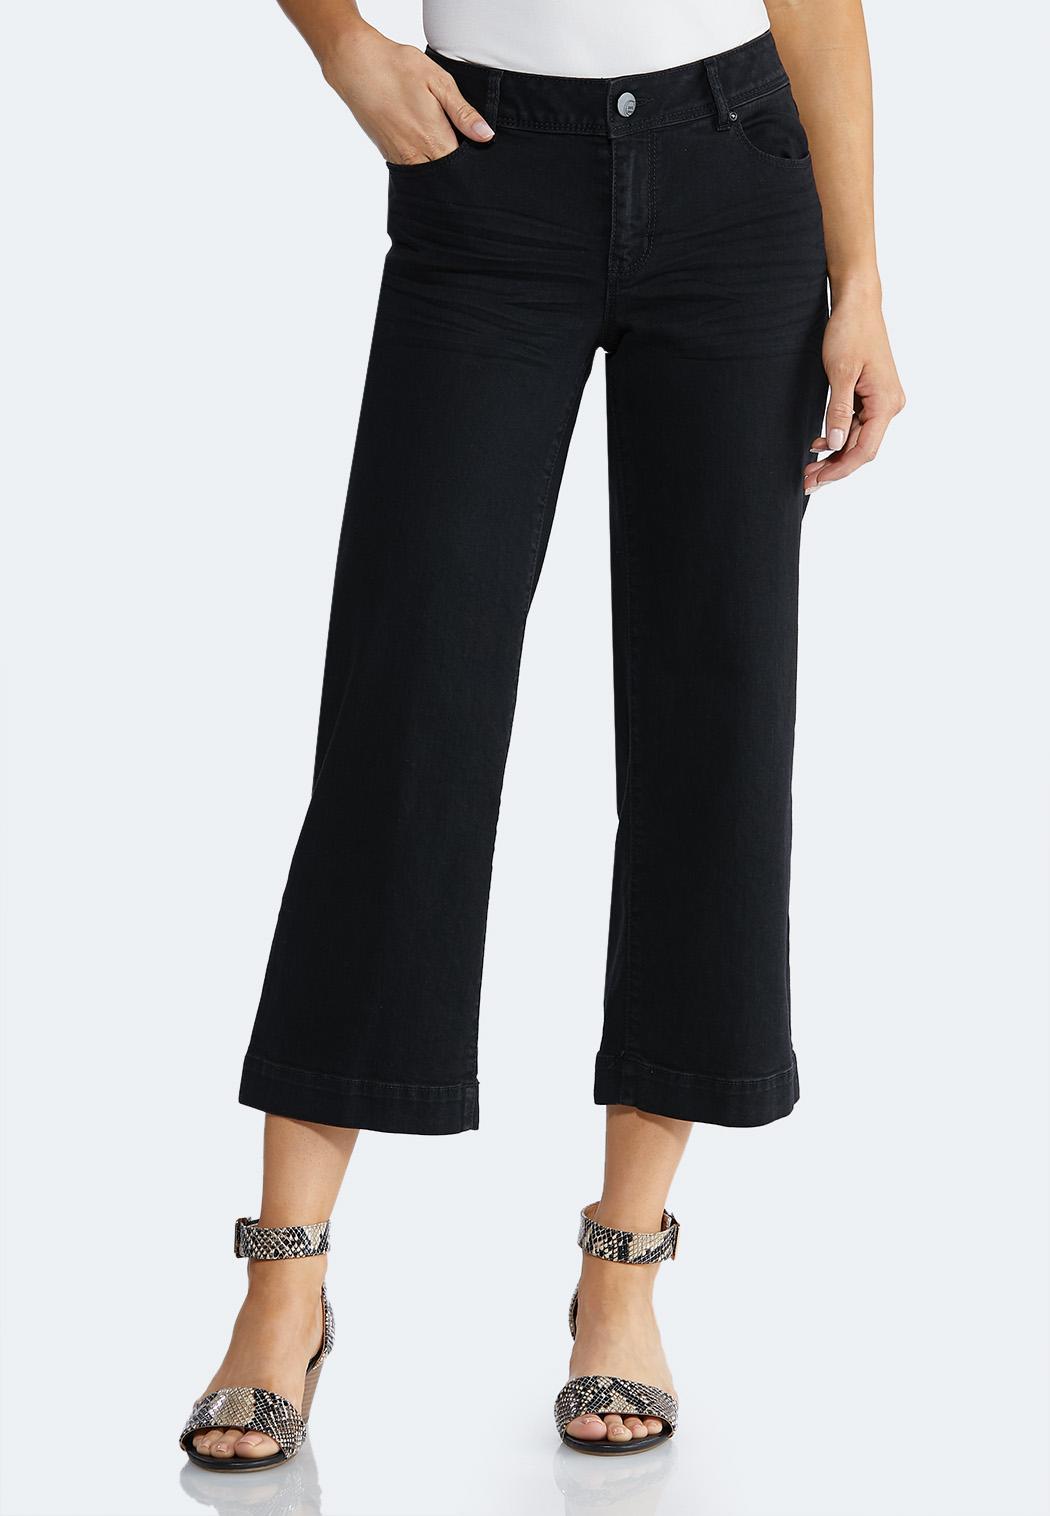 518aeb6d6c Jeans For Women - Denim, Jackets, Skirts & Vests